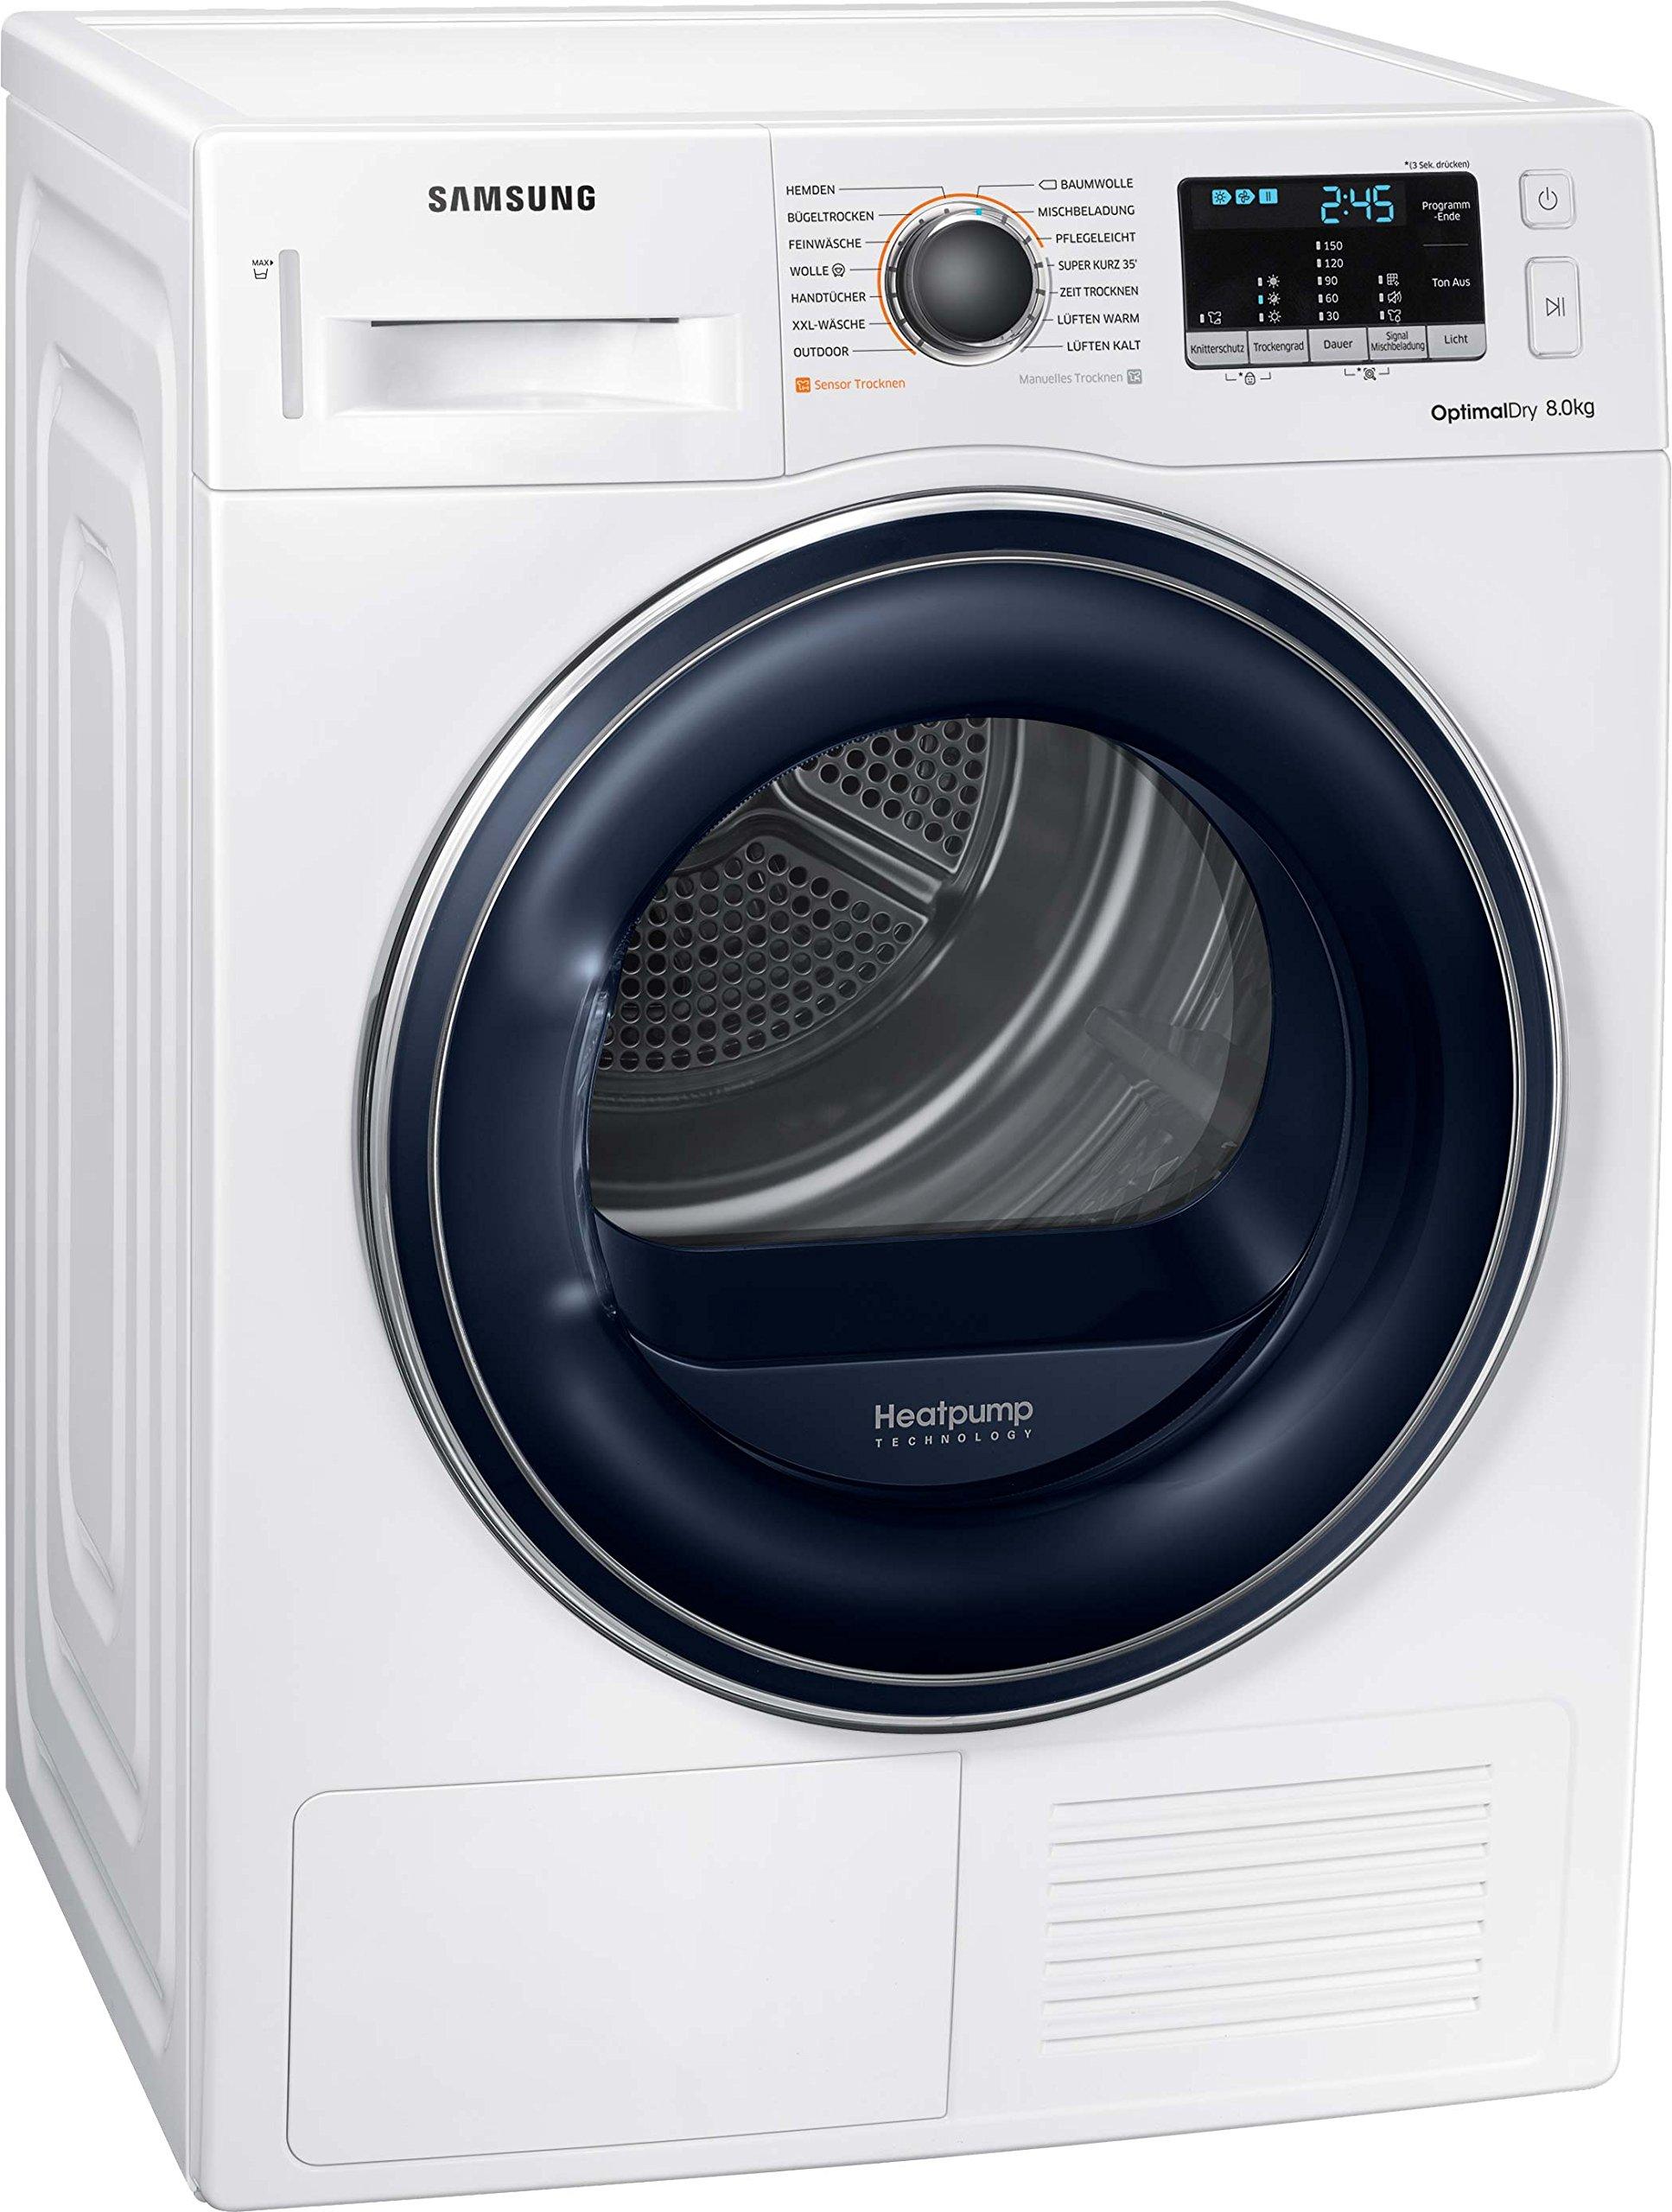 Samsung-DV8800-DV90N8289AWEG-WrmepumpentrocknerASuperSpeed-3-kg-in-NUR-81-MinSuperSilentWei